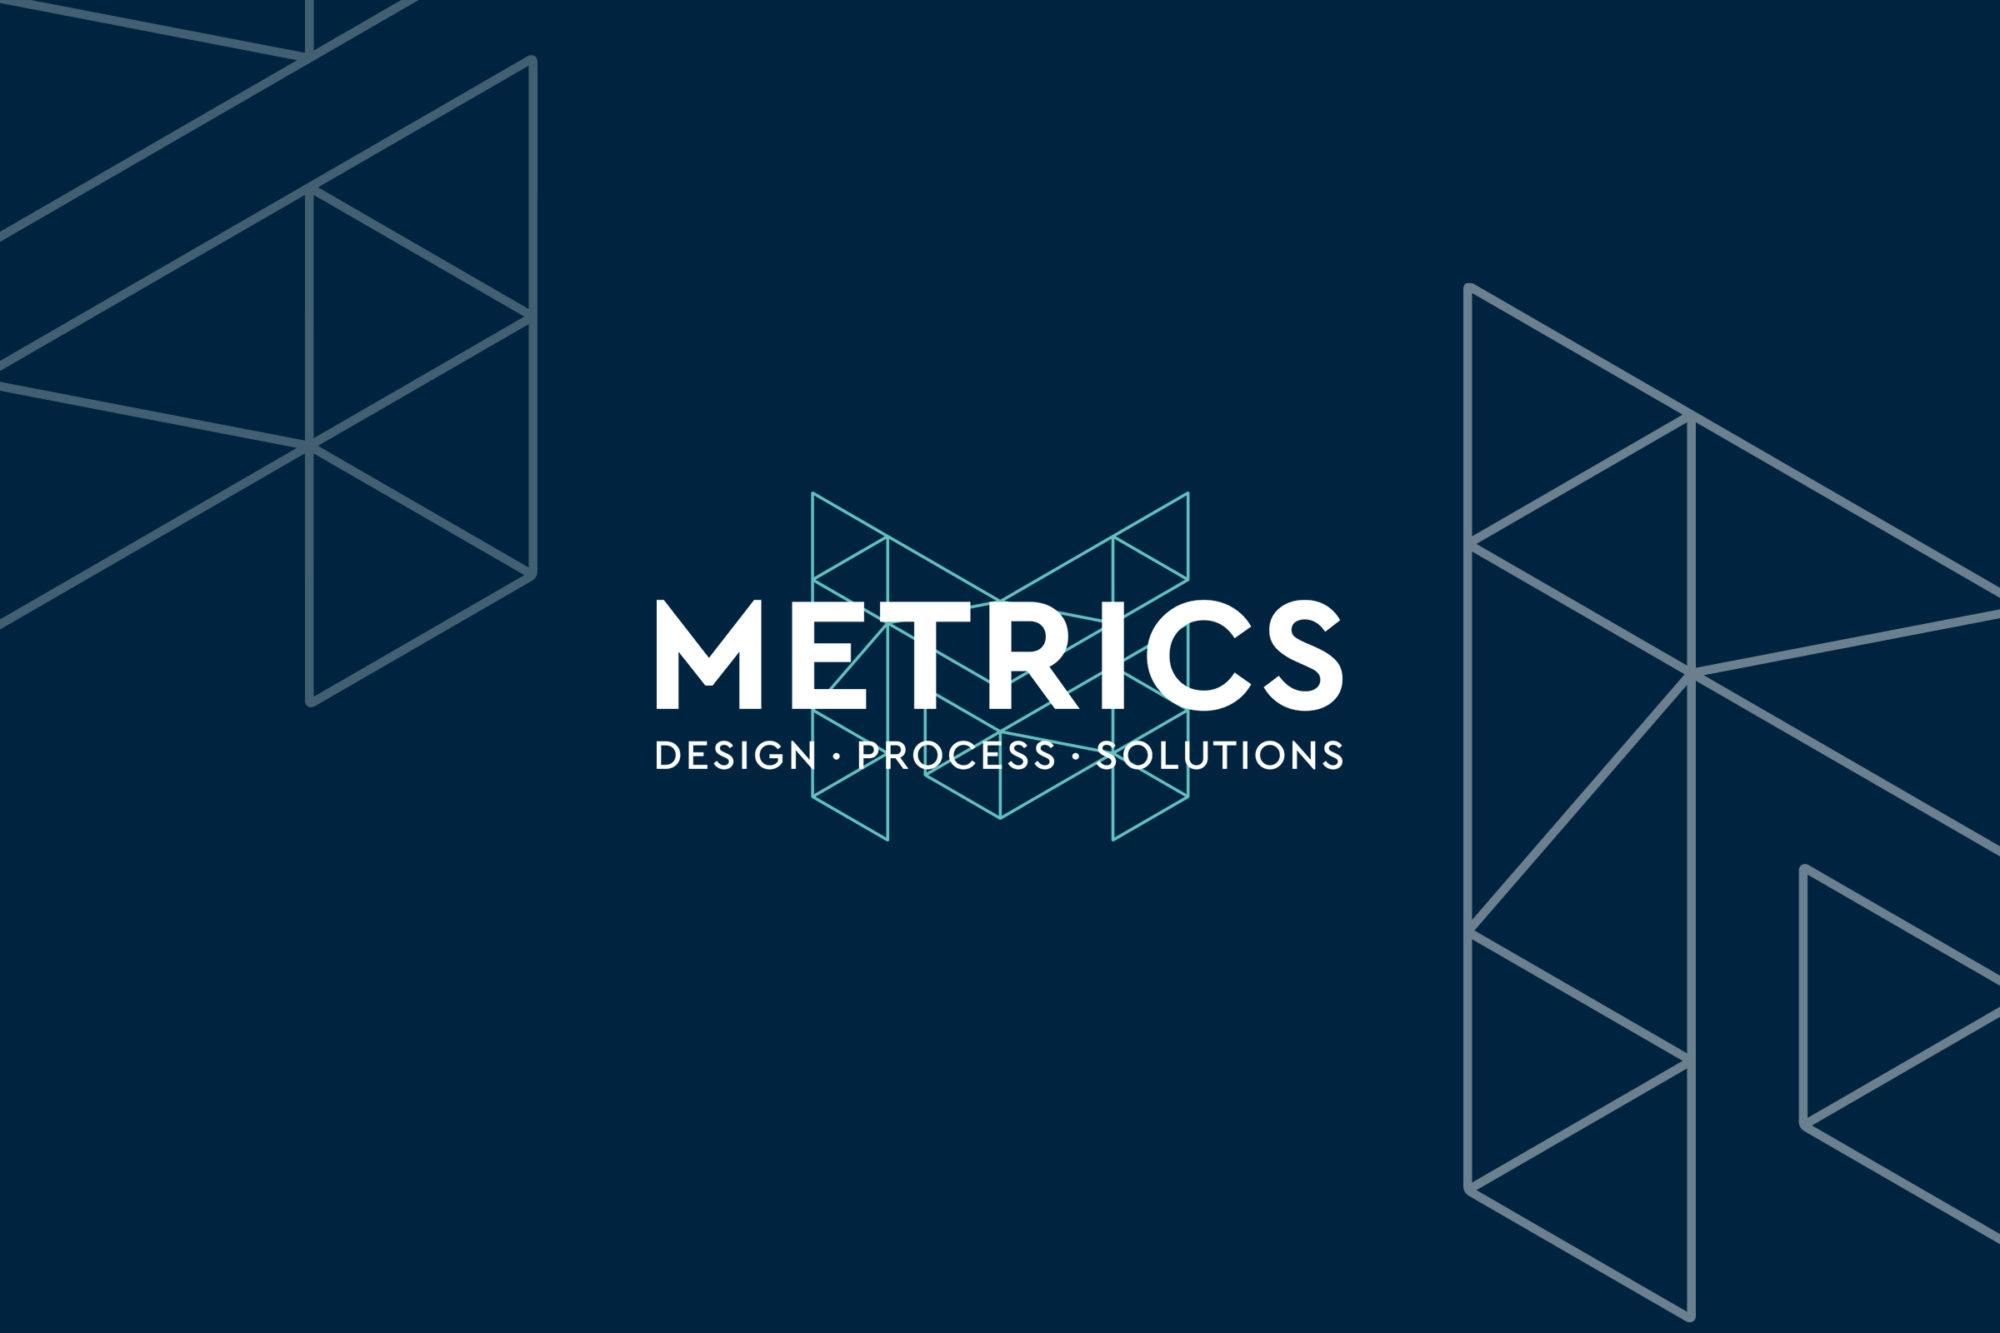 Metrics Design Logo on Blue